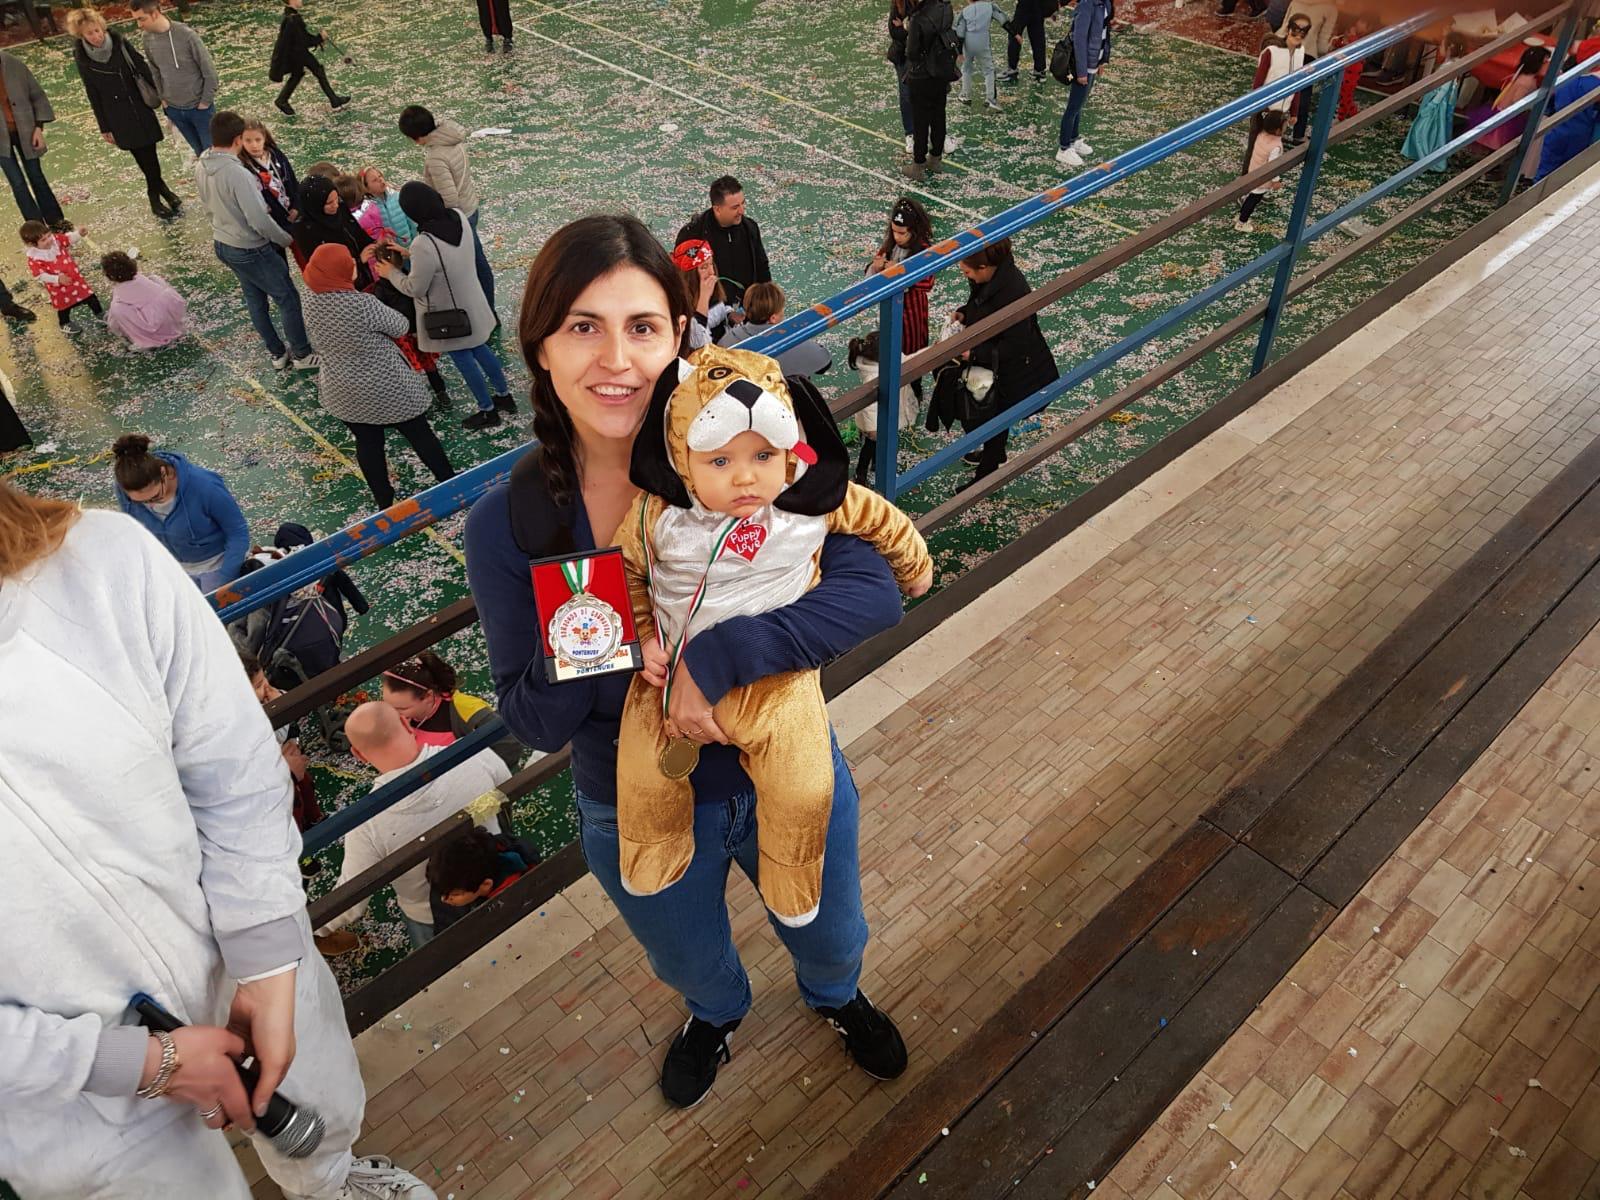 Baraonda Carnevale 2019 (28)